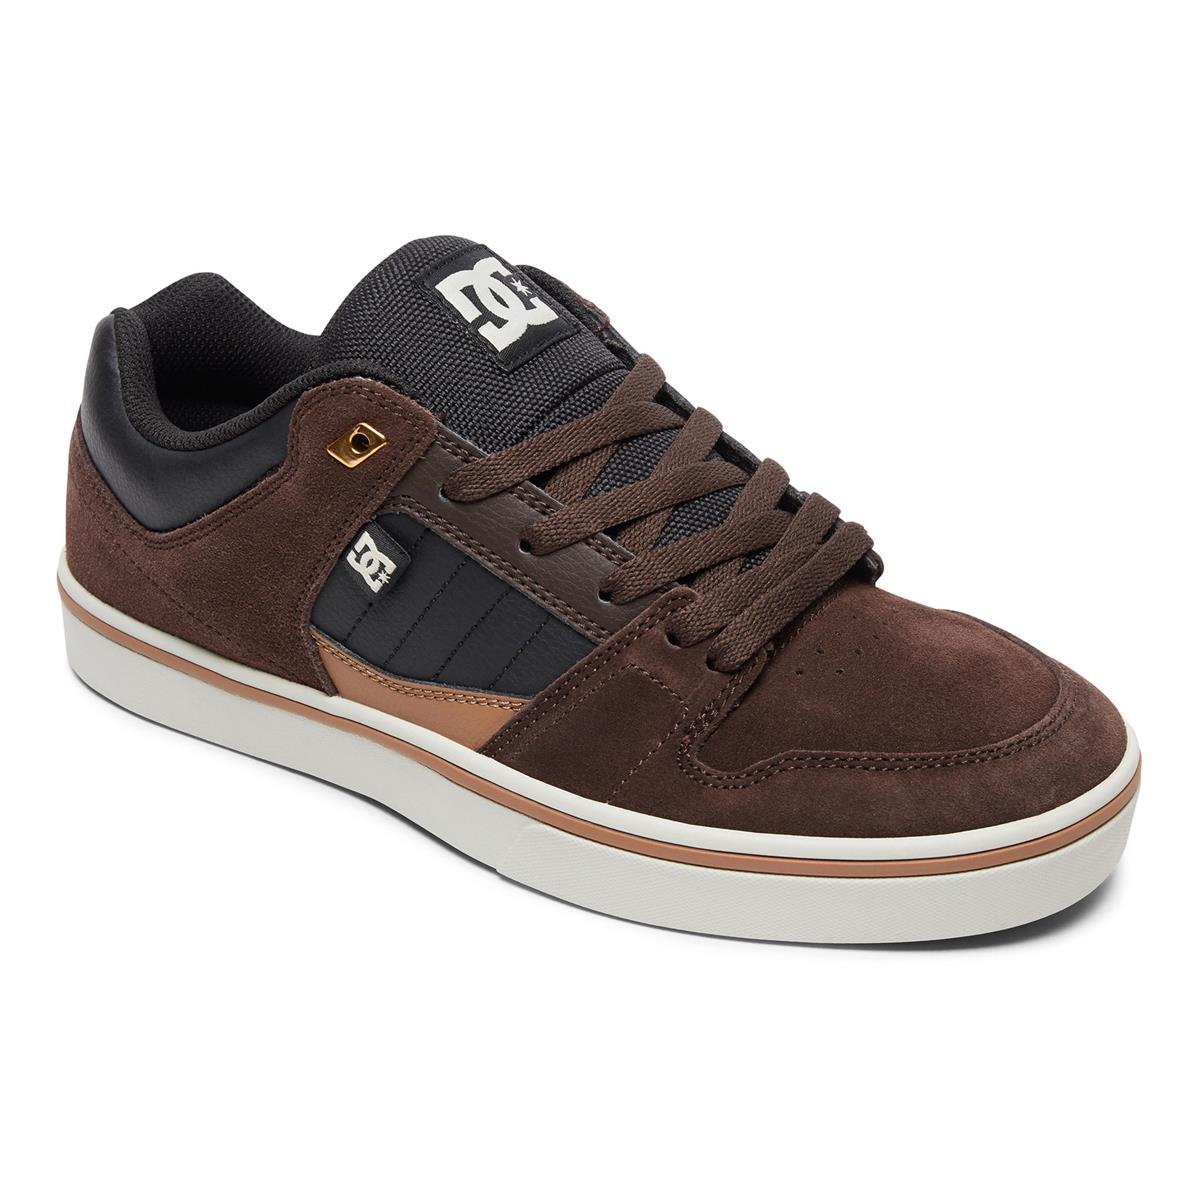 DC Schuhe Course 2 SE Braun Combo